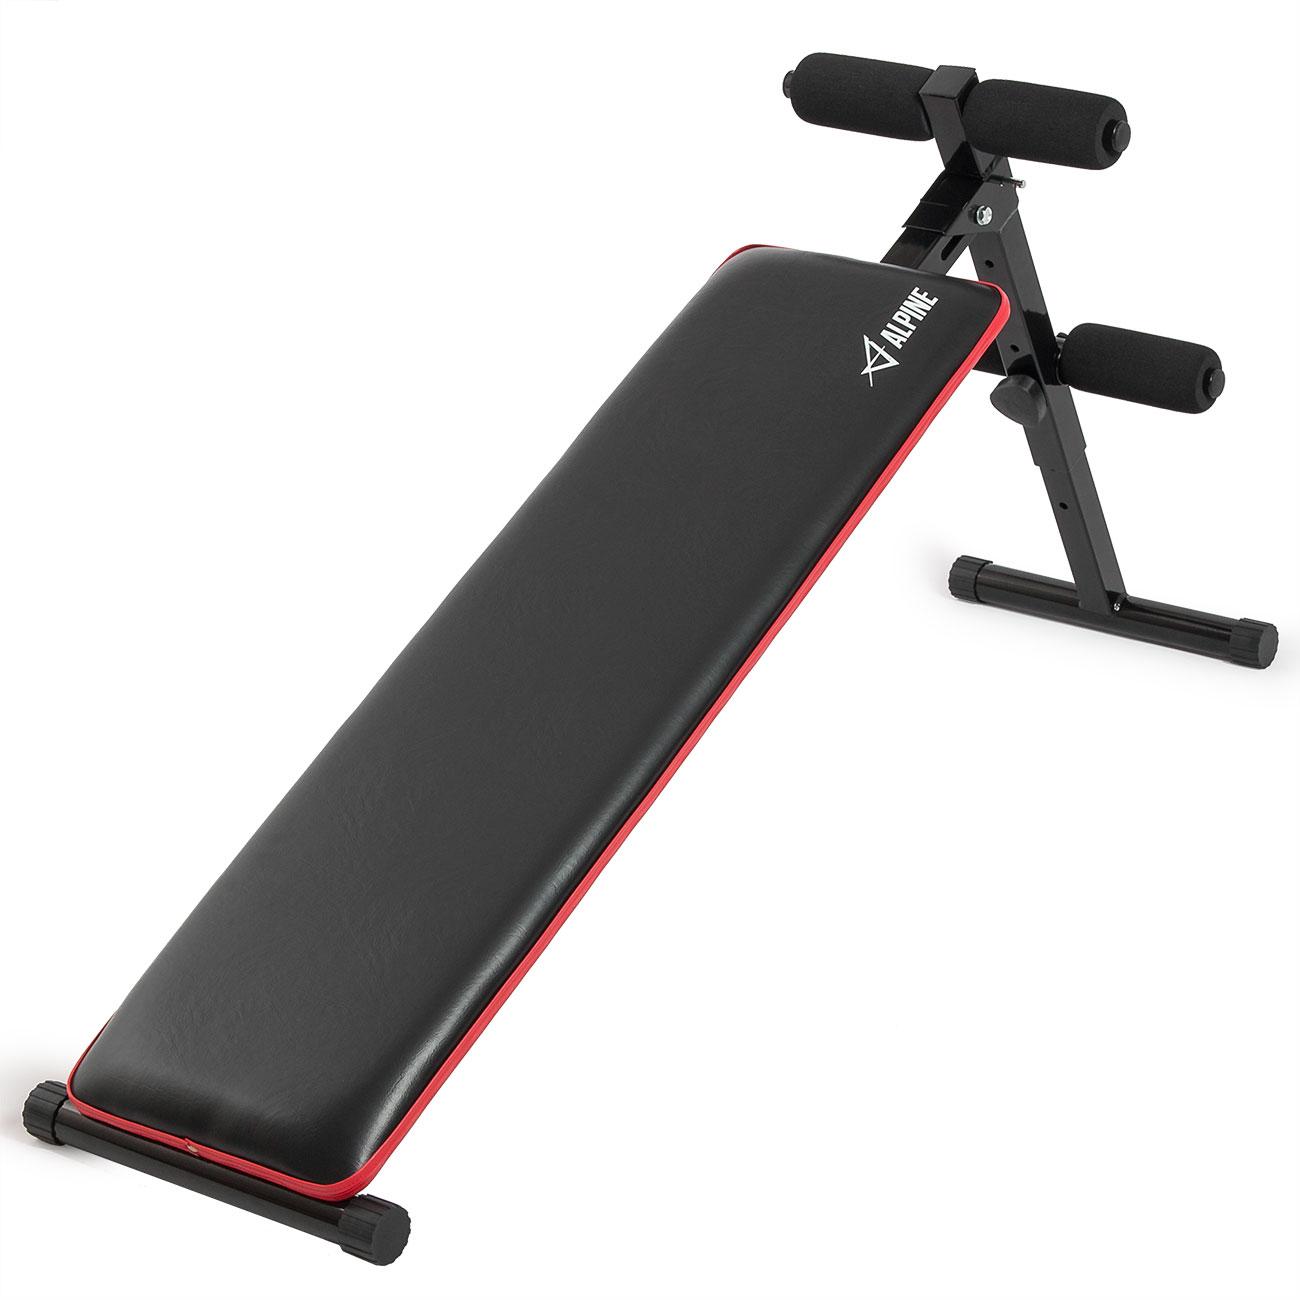 Adjustable Exercise Bench Sit Up Ab Crunch Board Decline